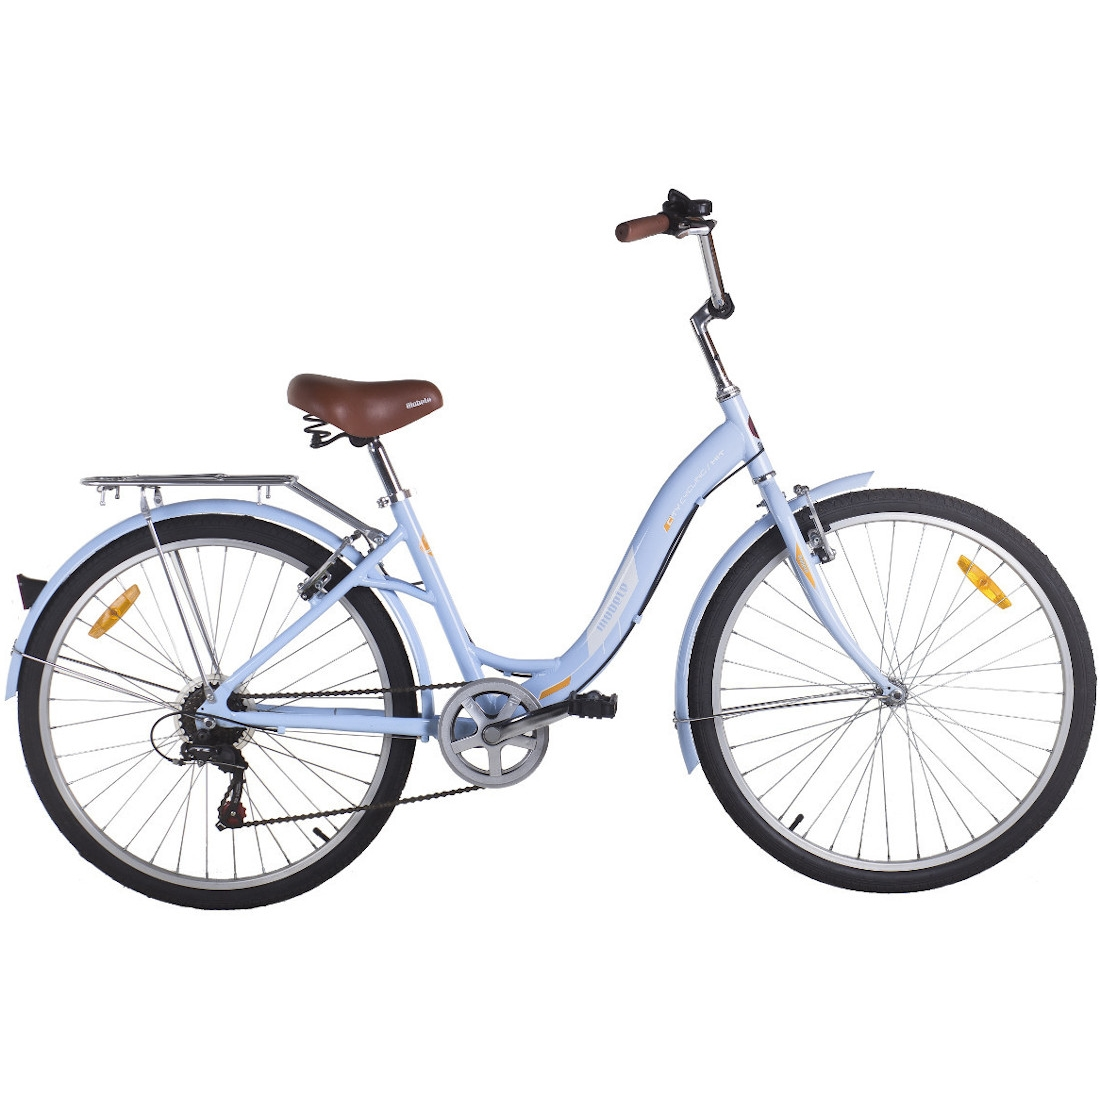 Bicicleta Vintage Retrô Hit Aro 26 7V Shimano Azul Mobele